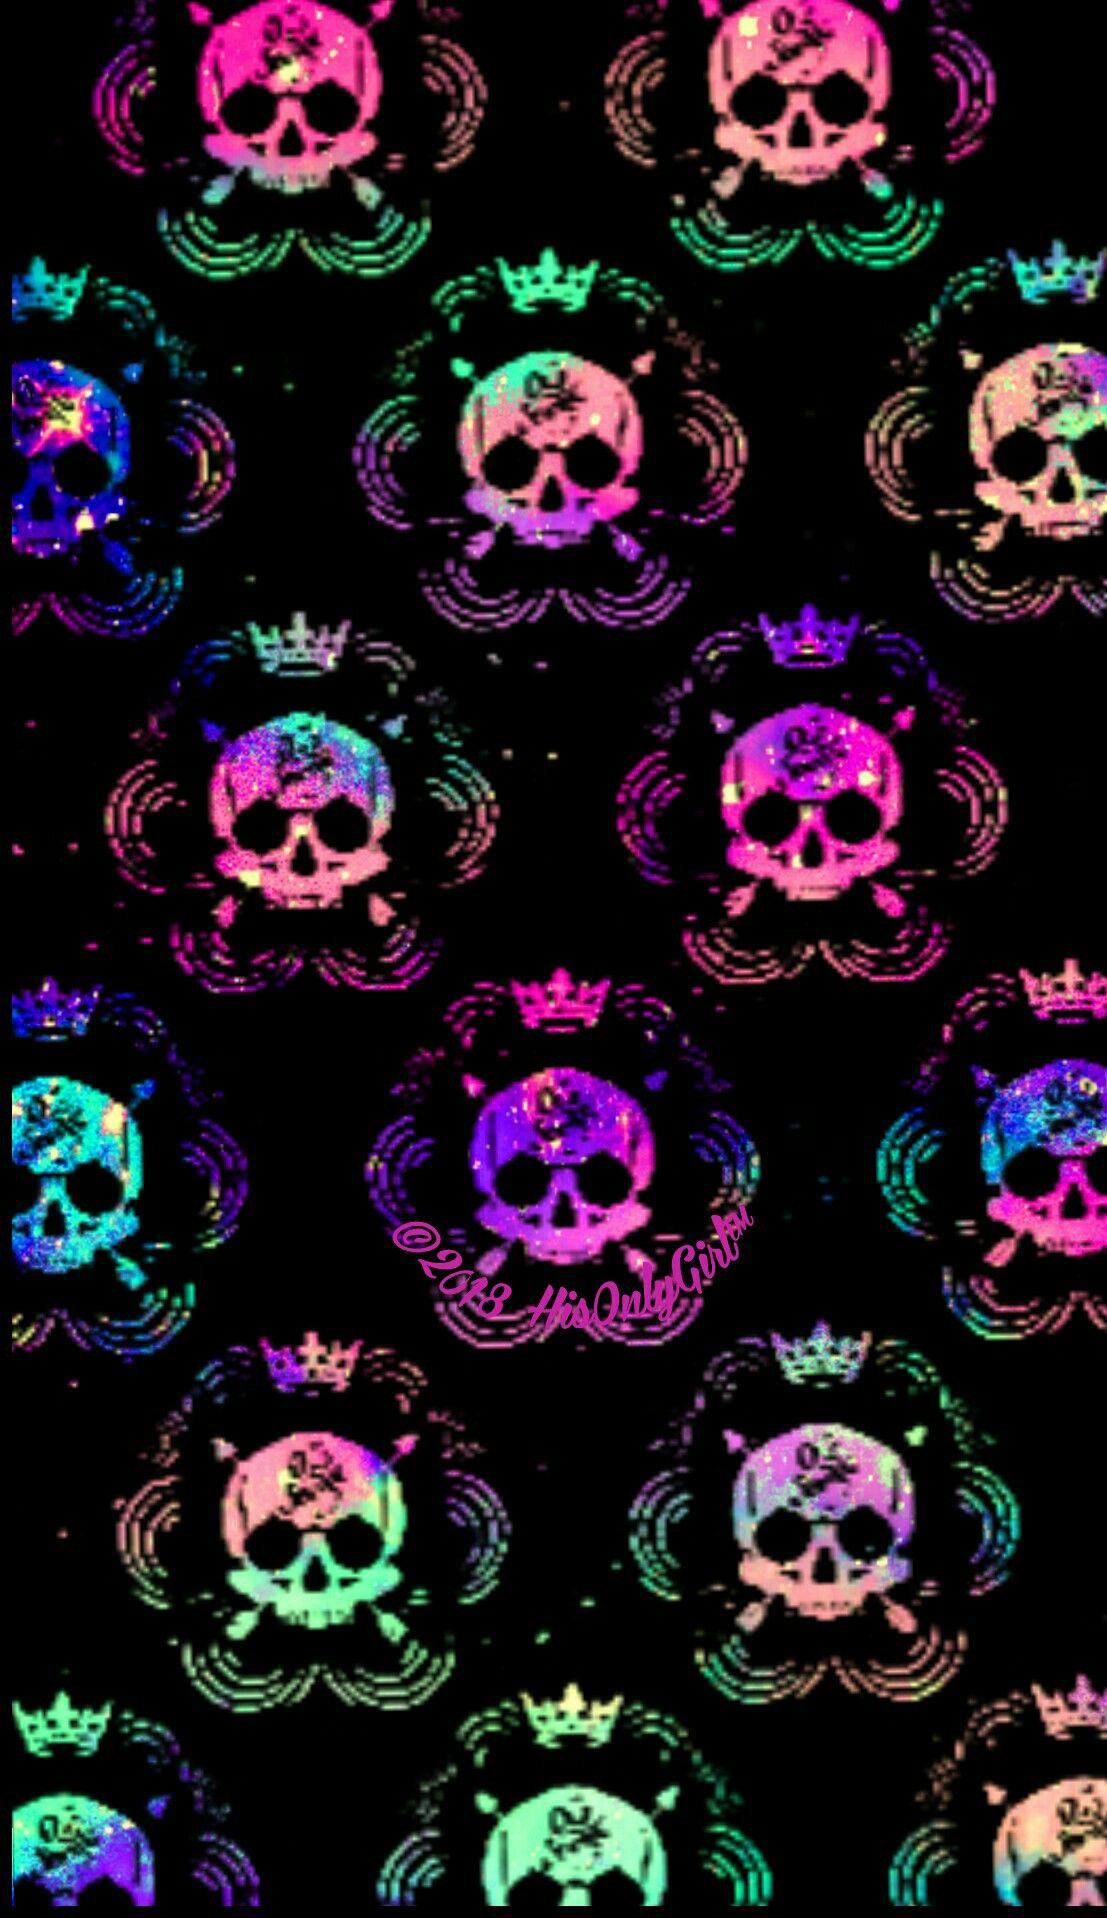 Pin by 𝓜𝓲𝔃𝓴𝓪𝔂𝓽 on ρ૨єττყ ωคℓℓเєઽ Skull wallpaper, Galaxy